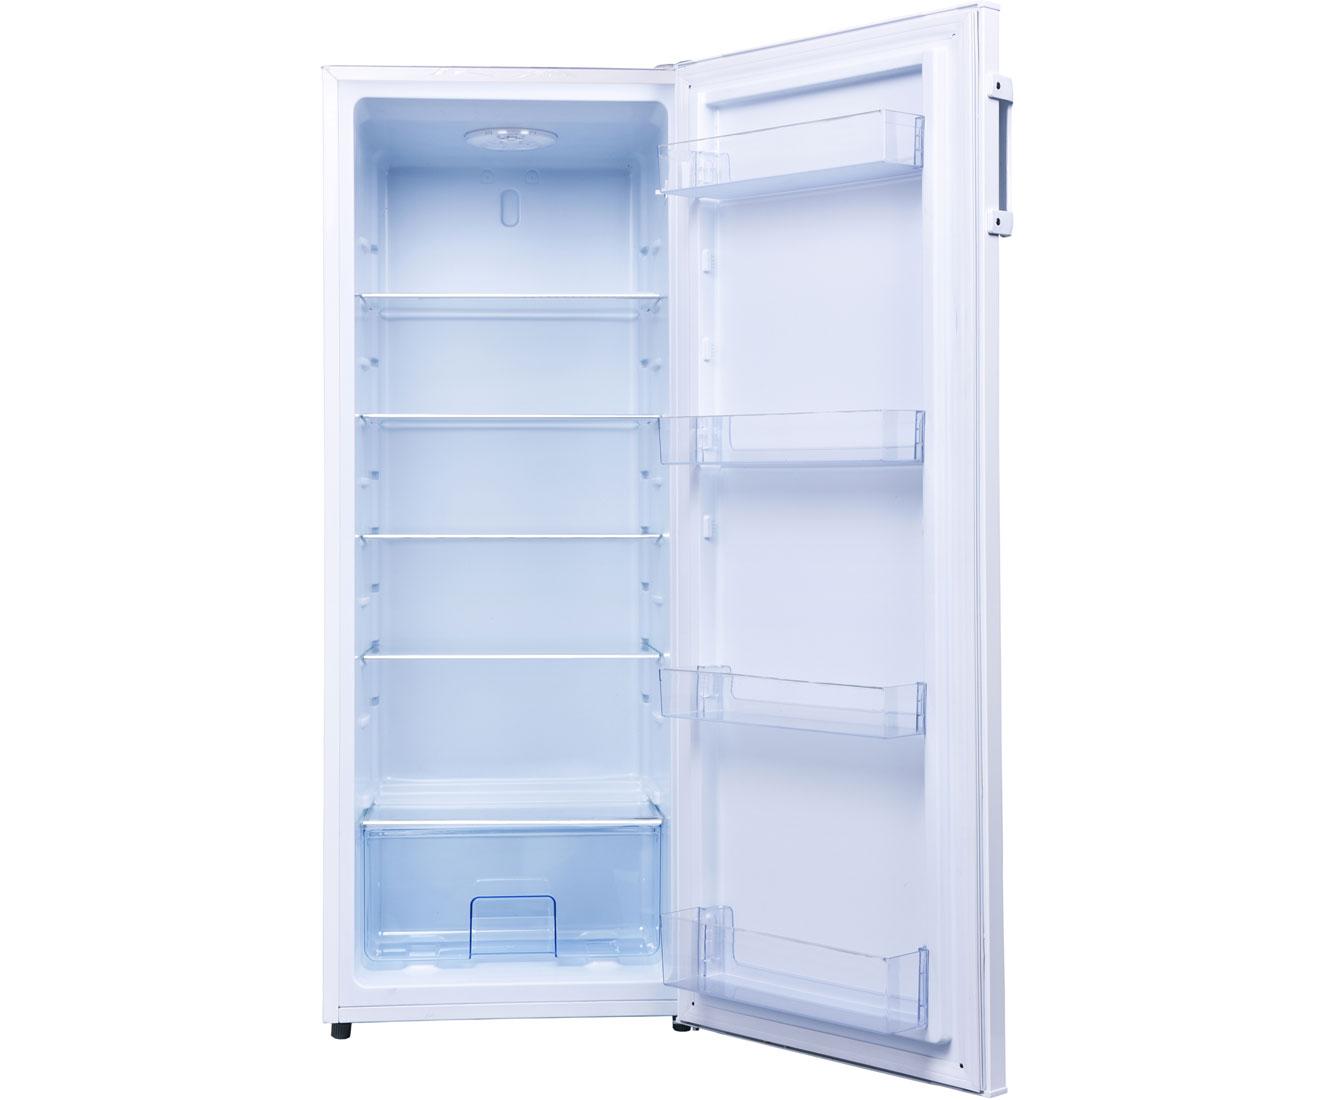 Amica Kühlschrank Vks 15780 E : Amica kühlschrank vks e dometic hipro standard autonome l c